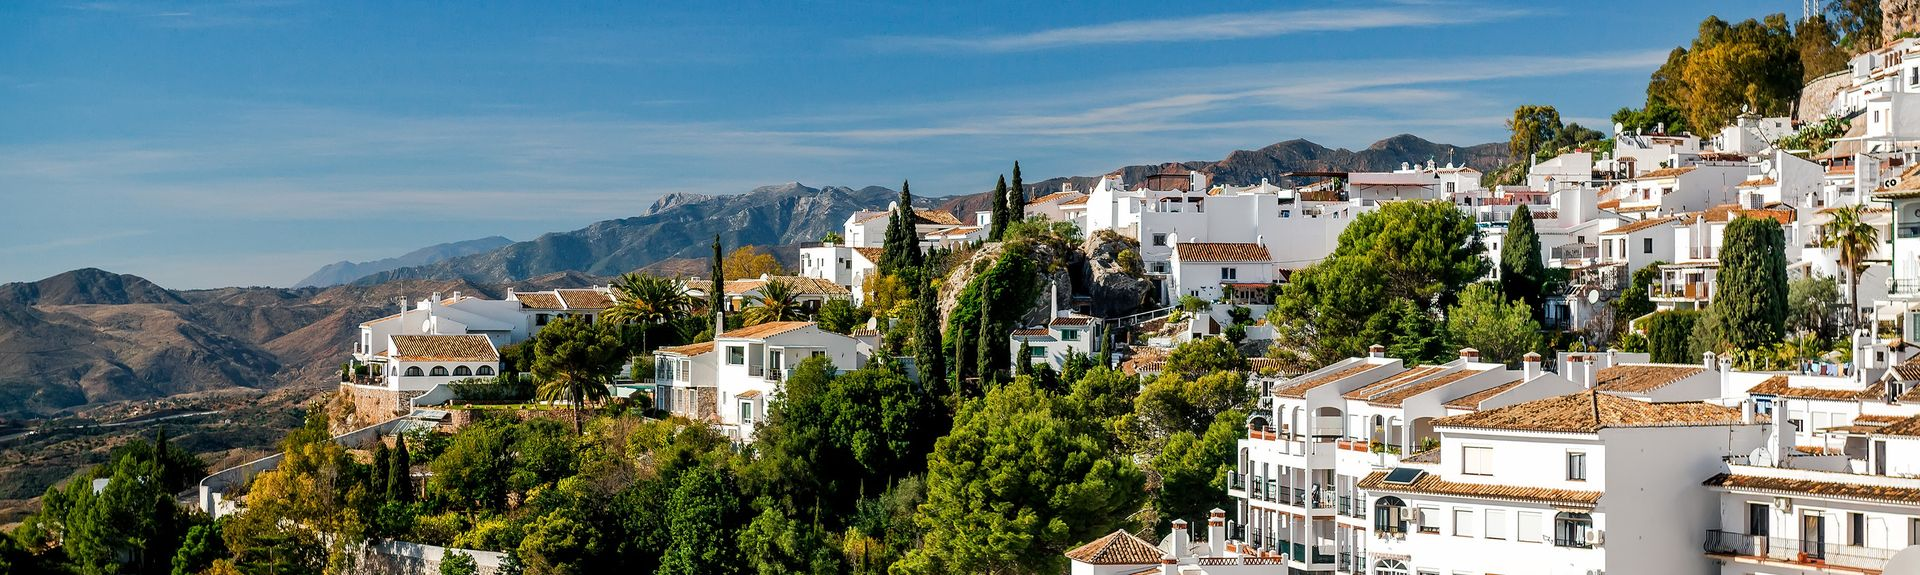 Mijas Costa, Andalusien, Spanien